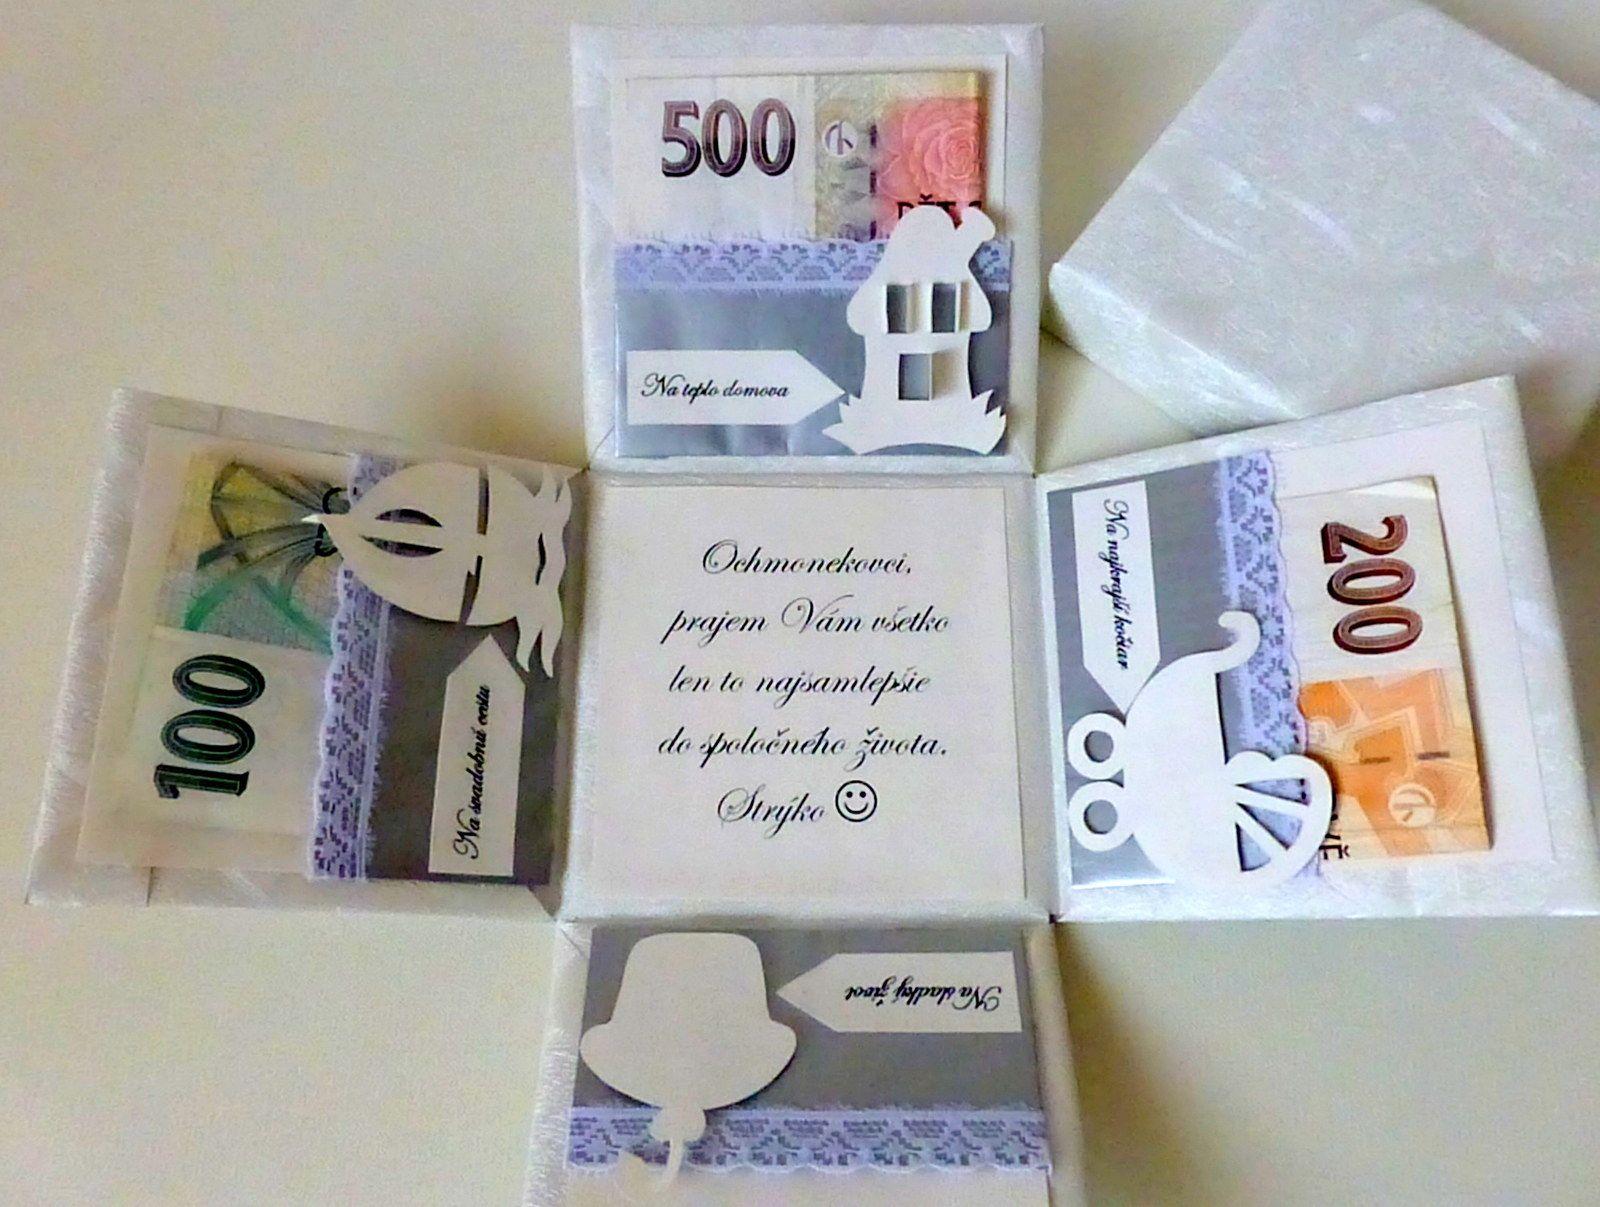 7 origin lnych sp sobov, ako darova peniaze - fluff